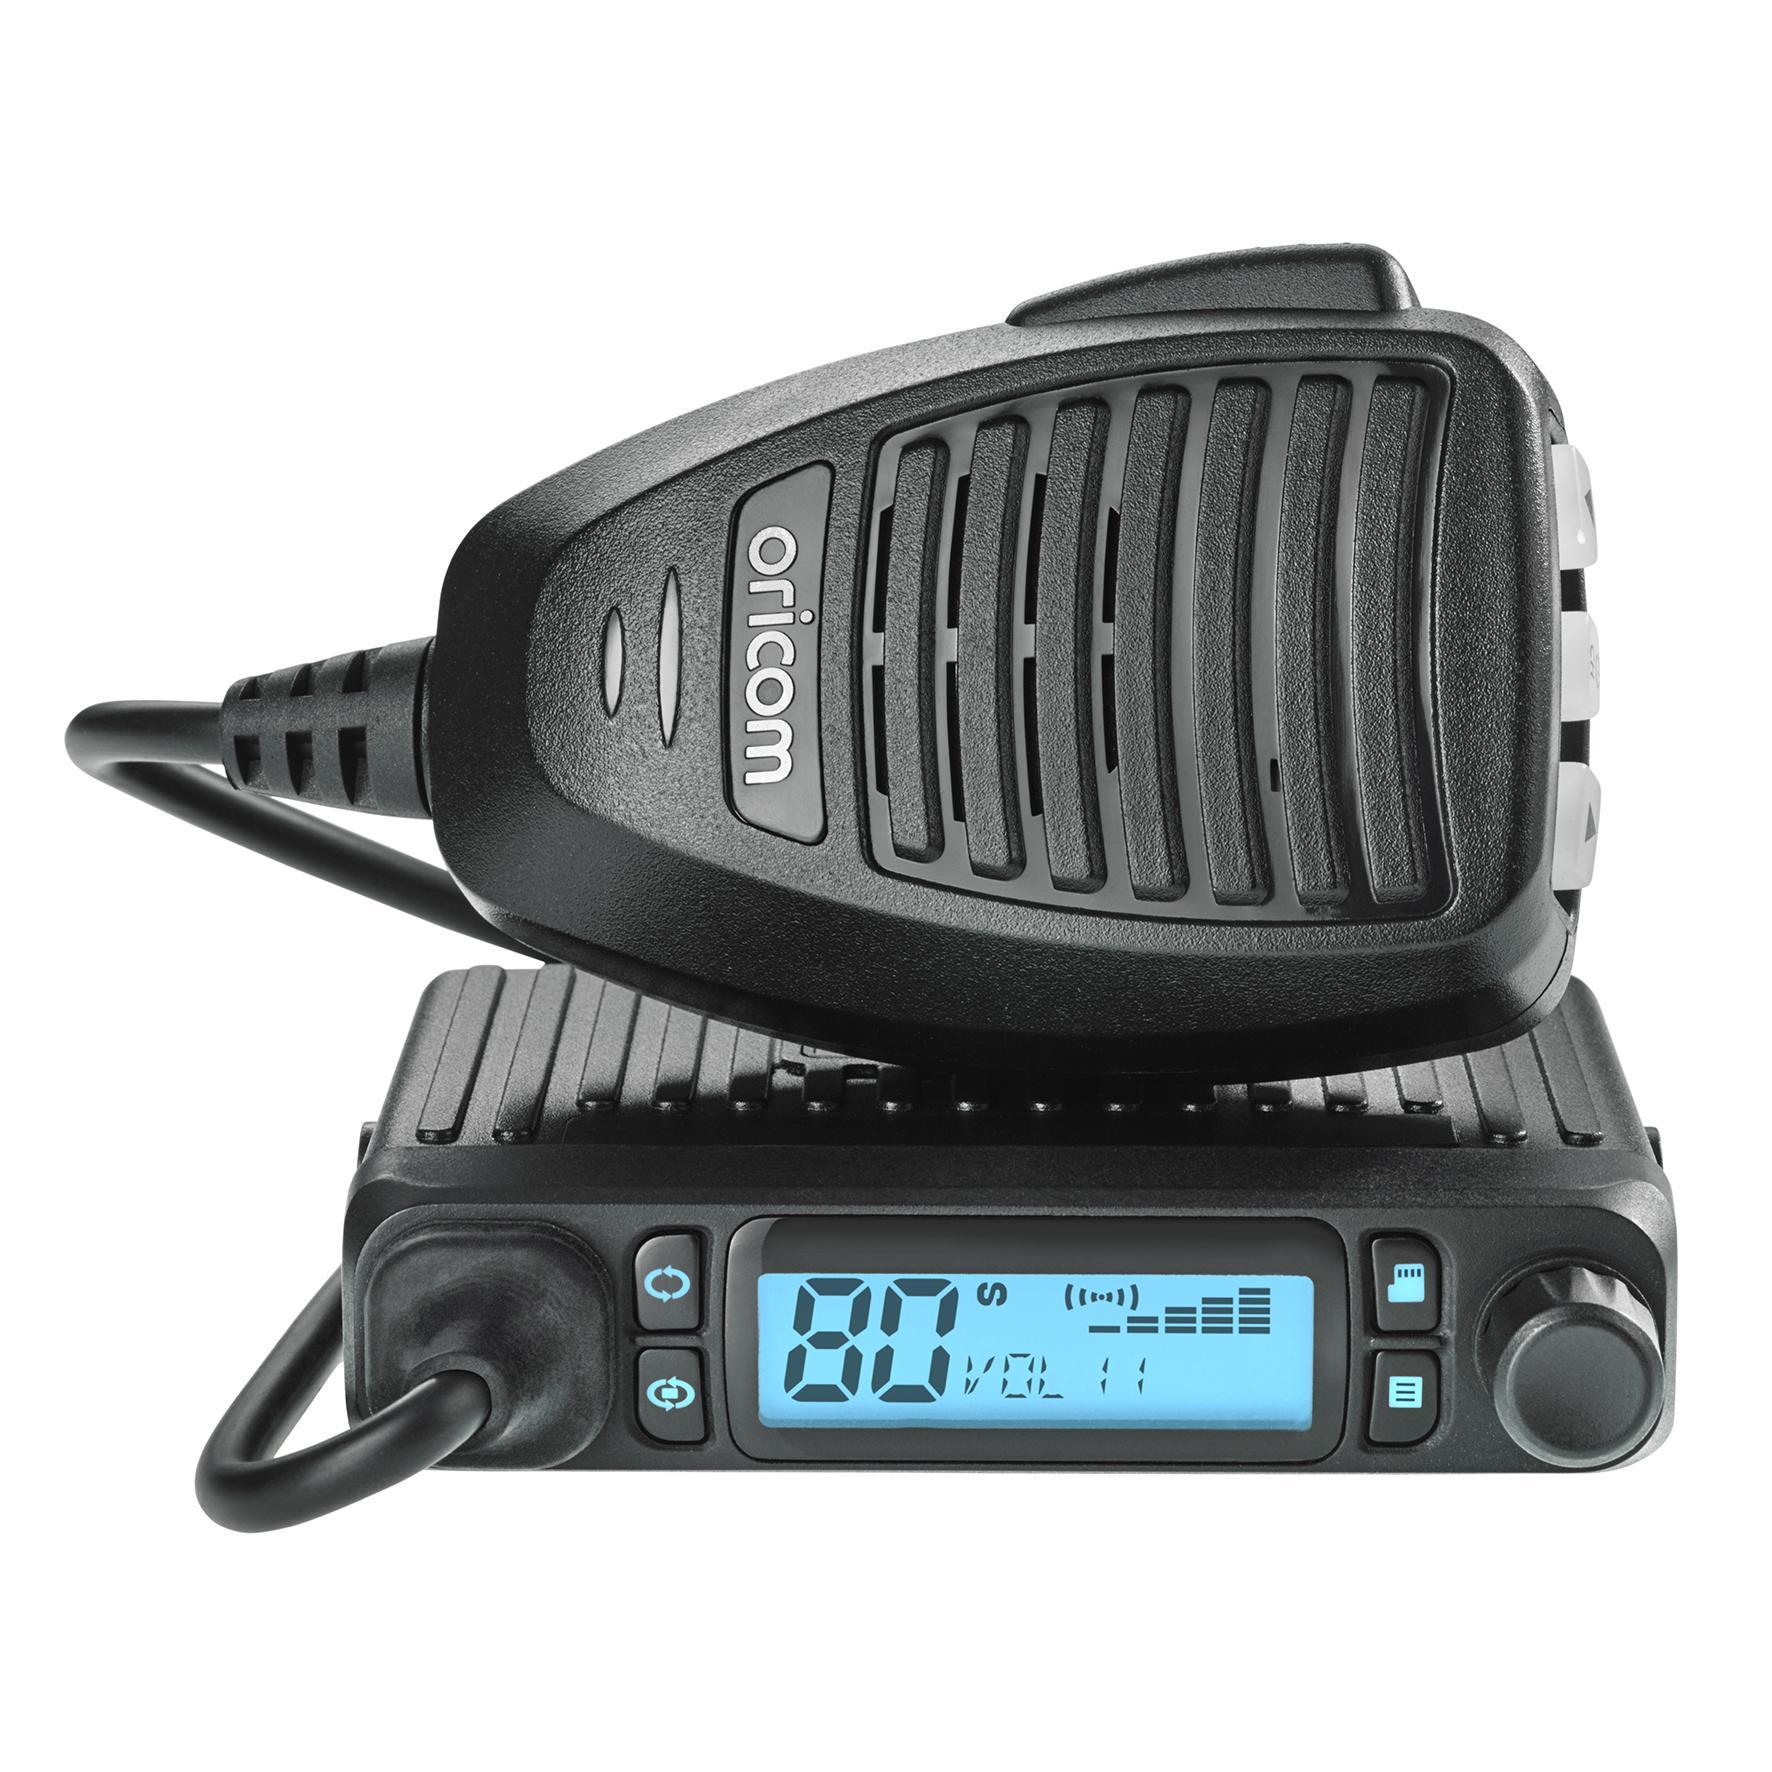 Oricom's DTX4300 ultra compact micro UHF CB